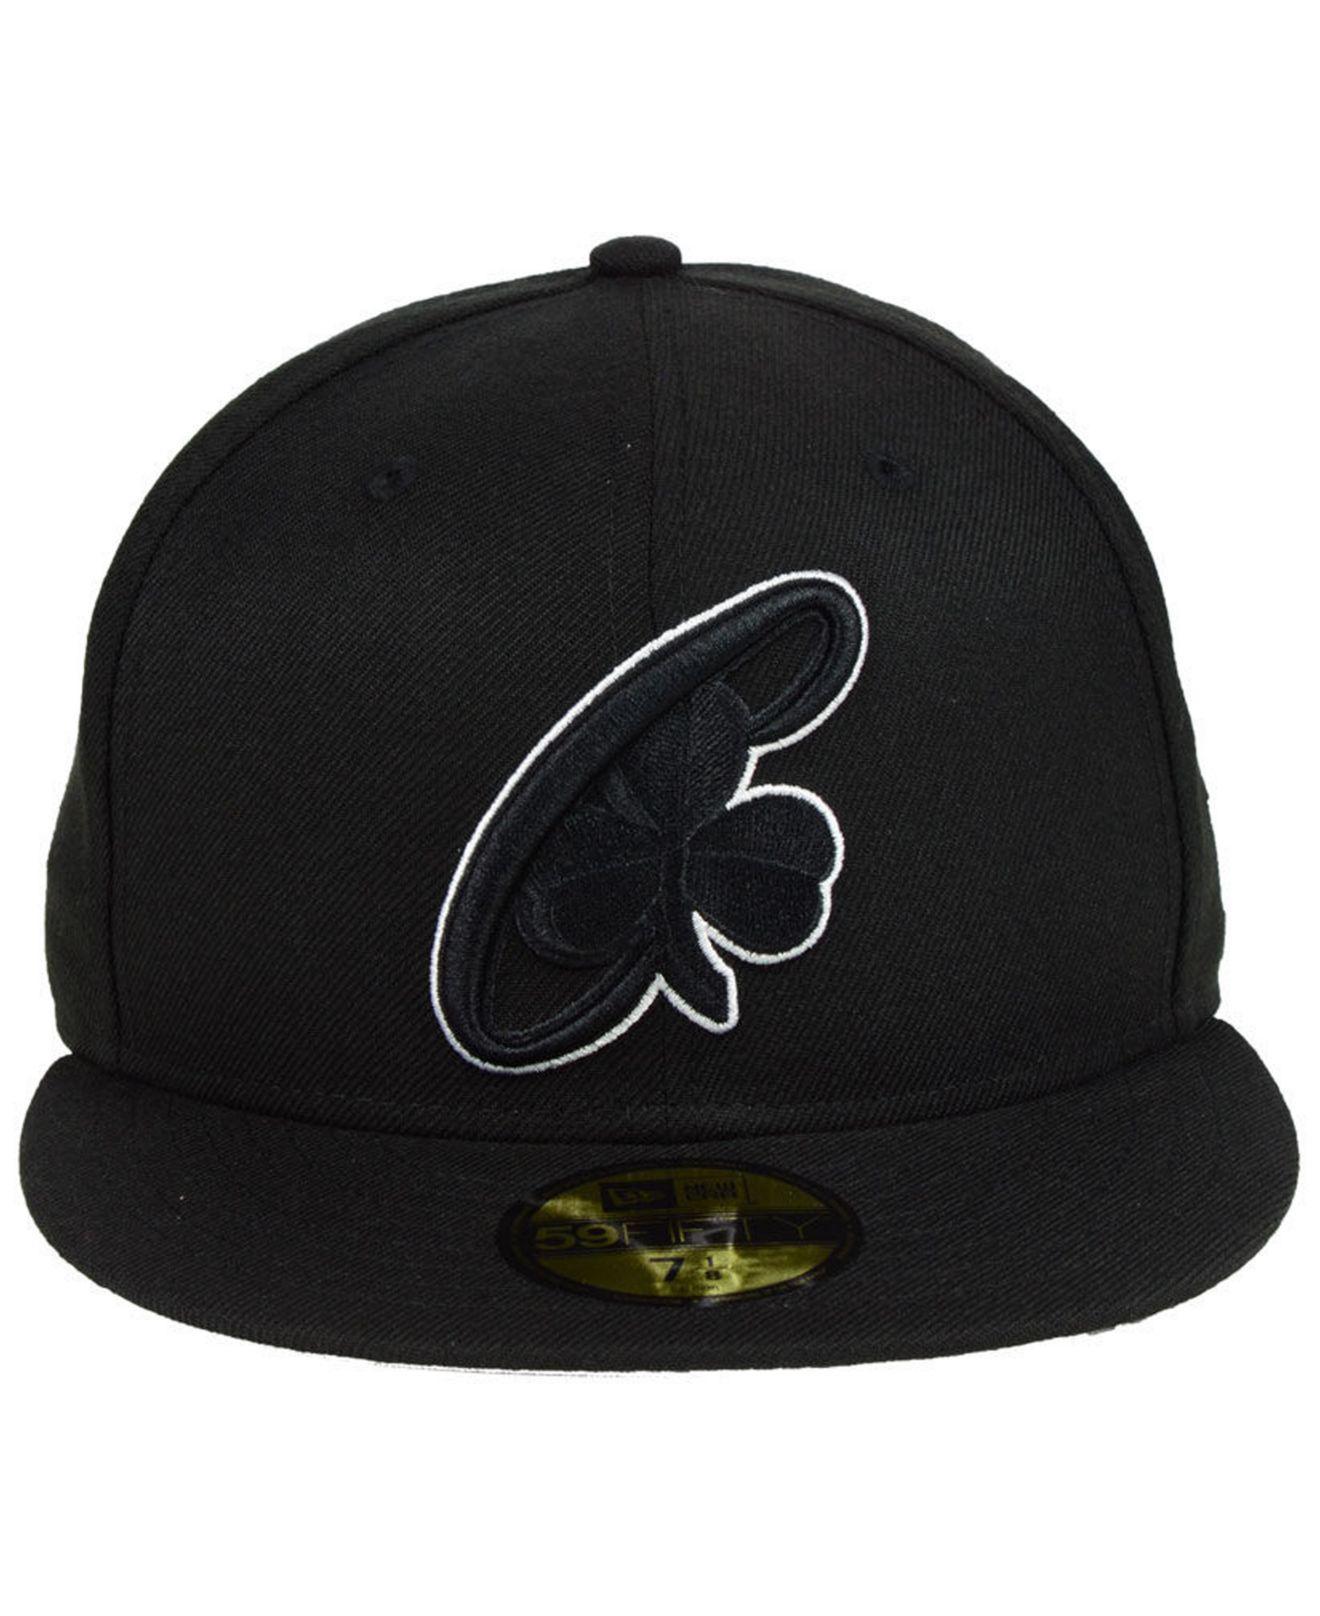 buy online 888c5 a3f35 ... switzerland lyst ktz boston celtics combo logo 59fifty fitted cap in  black for men 95f8d fb443